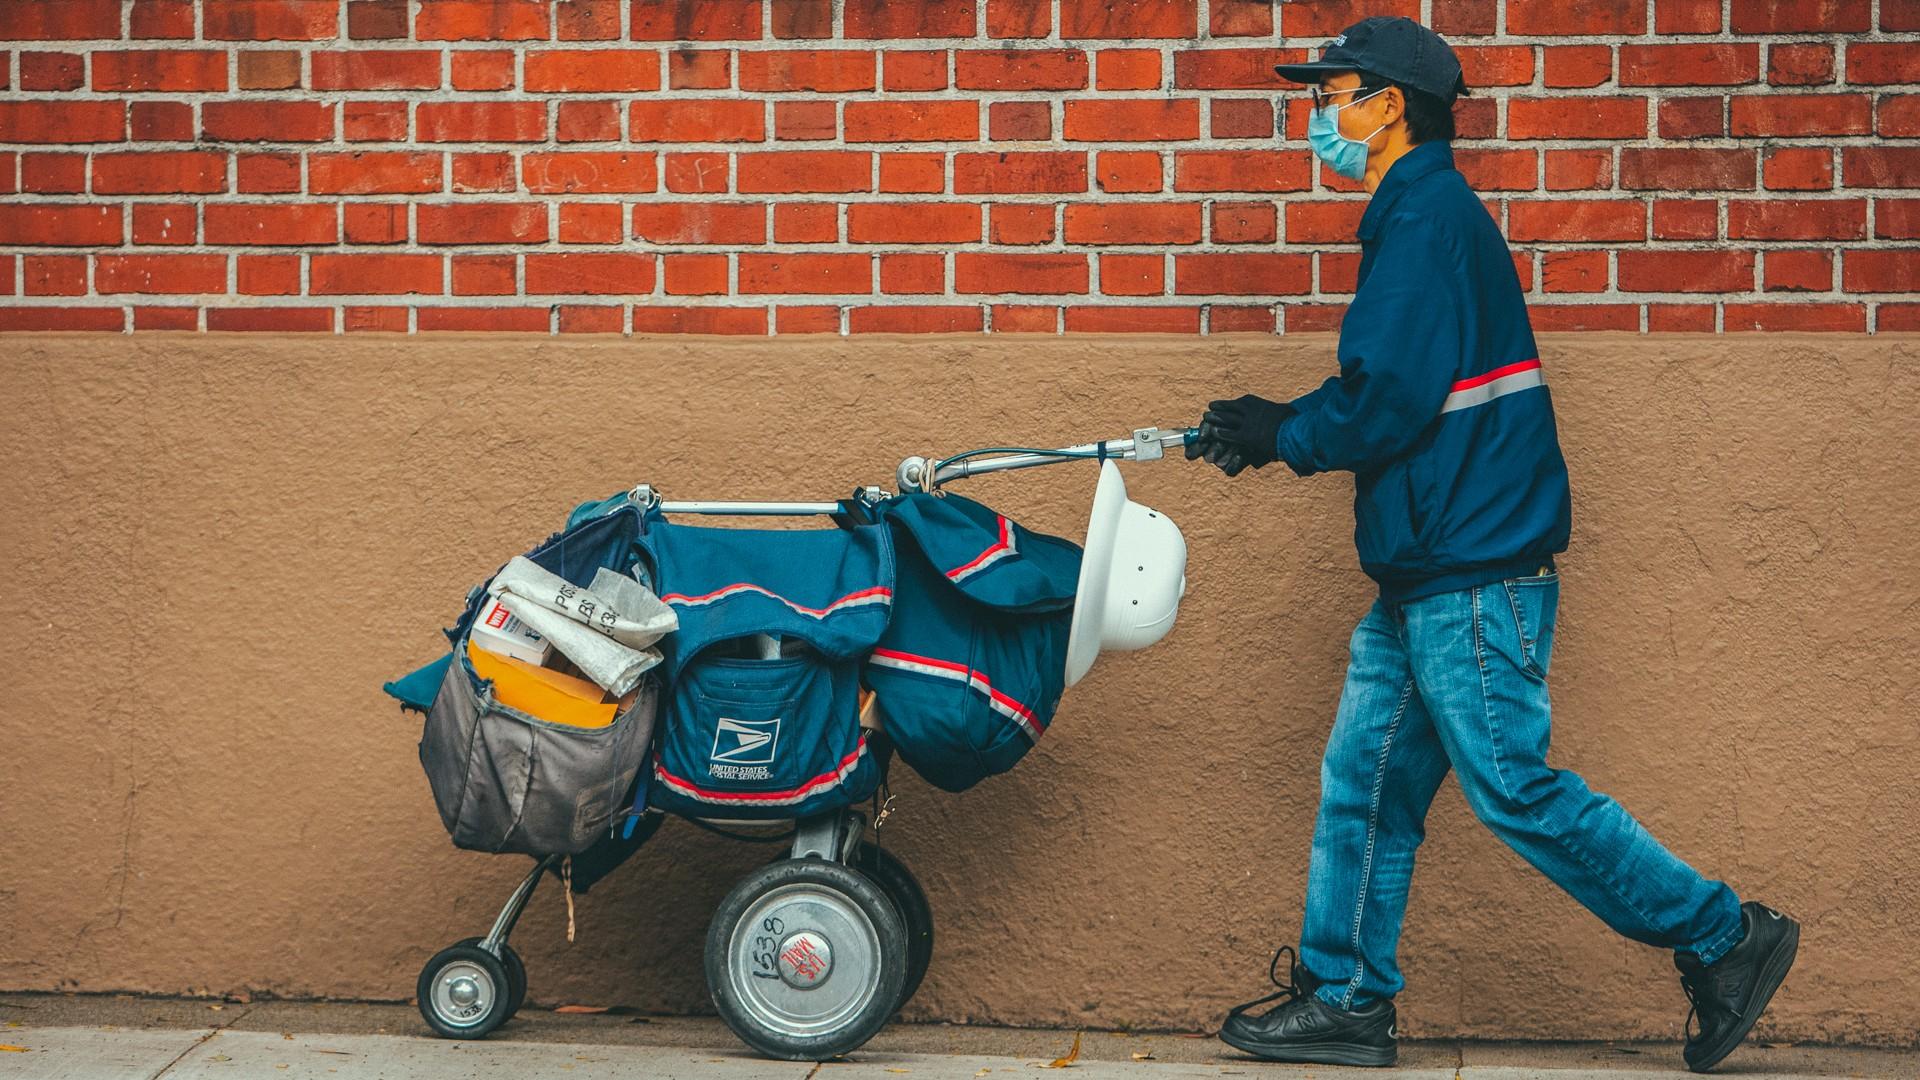 San Francisco, USA - April 4, 2020: San Francisco postal worker in mask delivering mail during stay-at-home order.